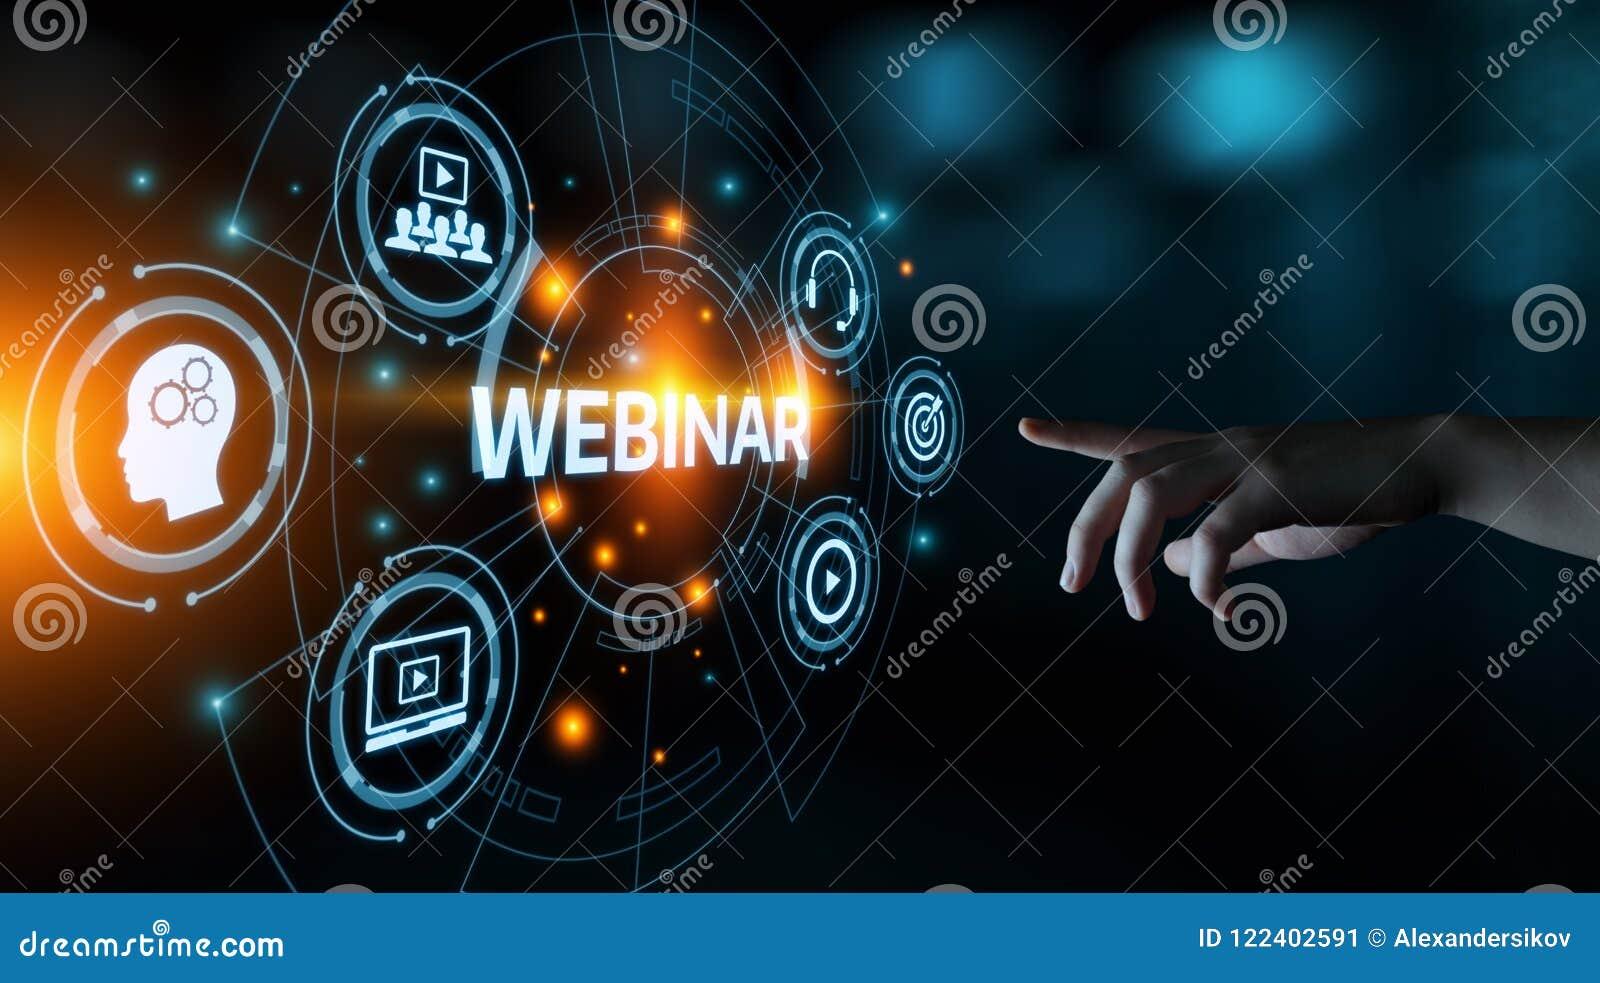 Webinar电子教学训练企业互联网技术概念